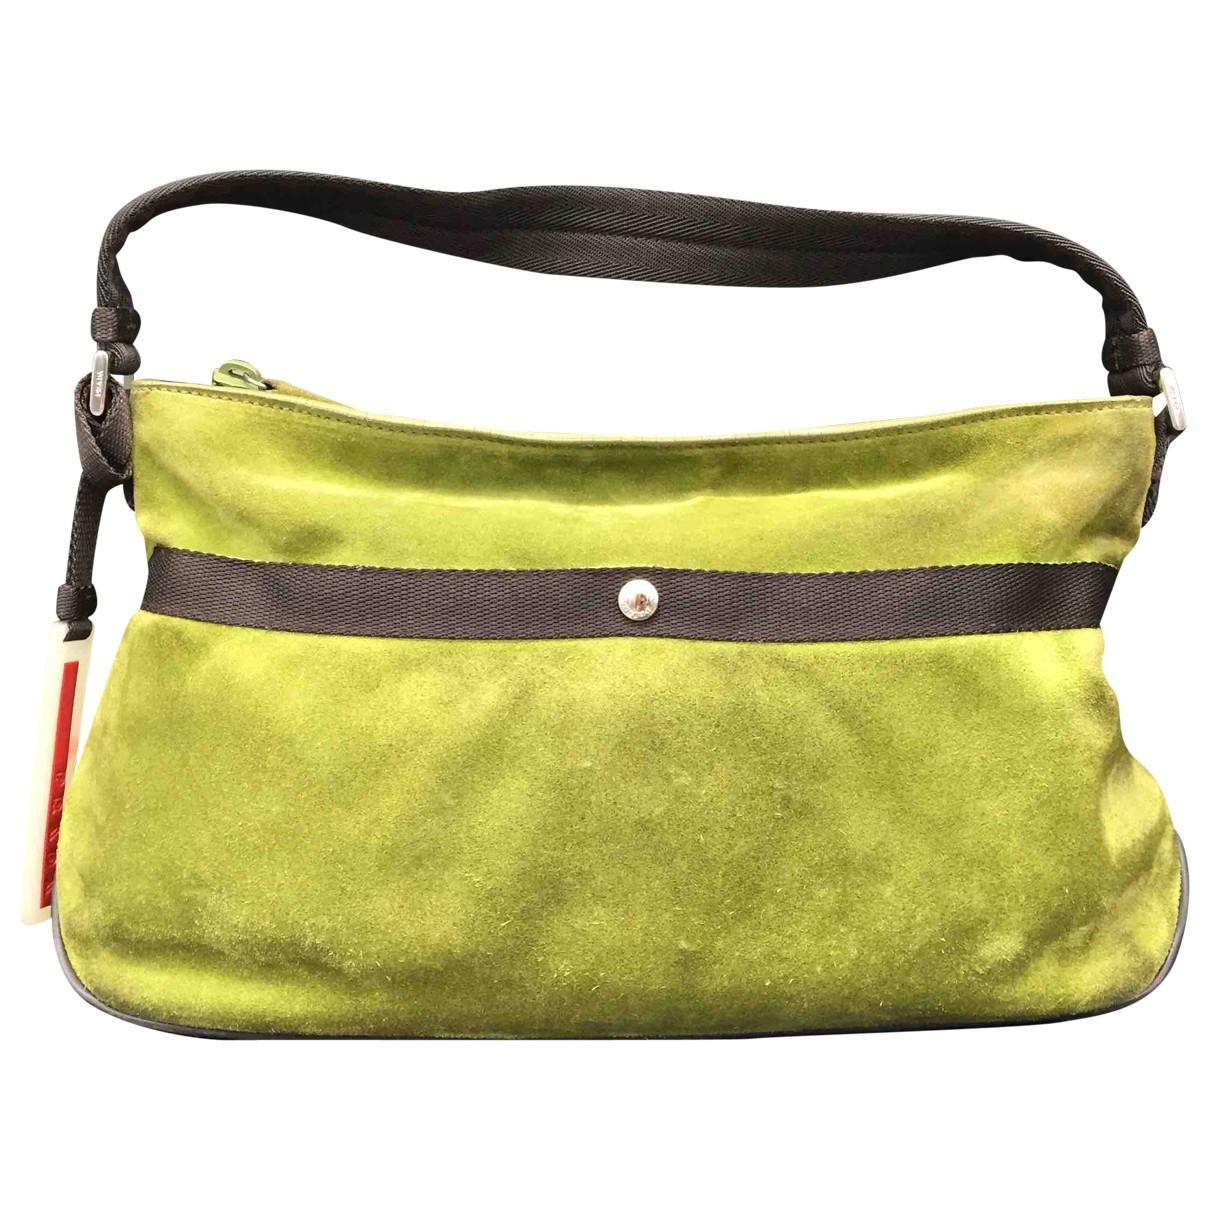 Prada \N Handtasche in  Gruen Veloursleder